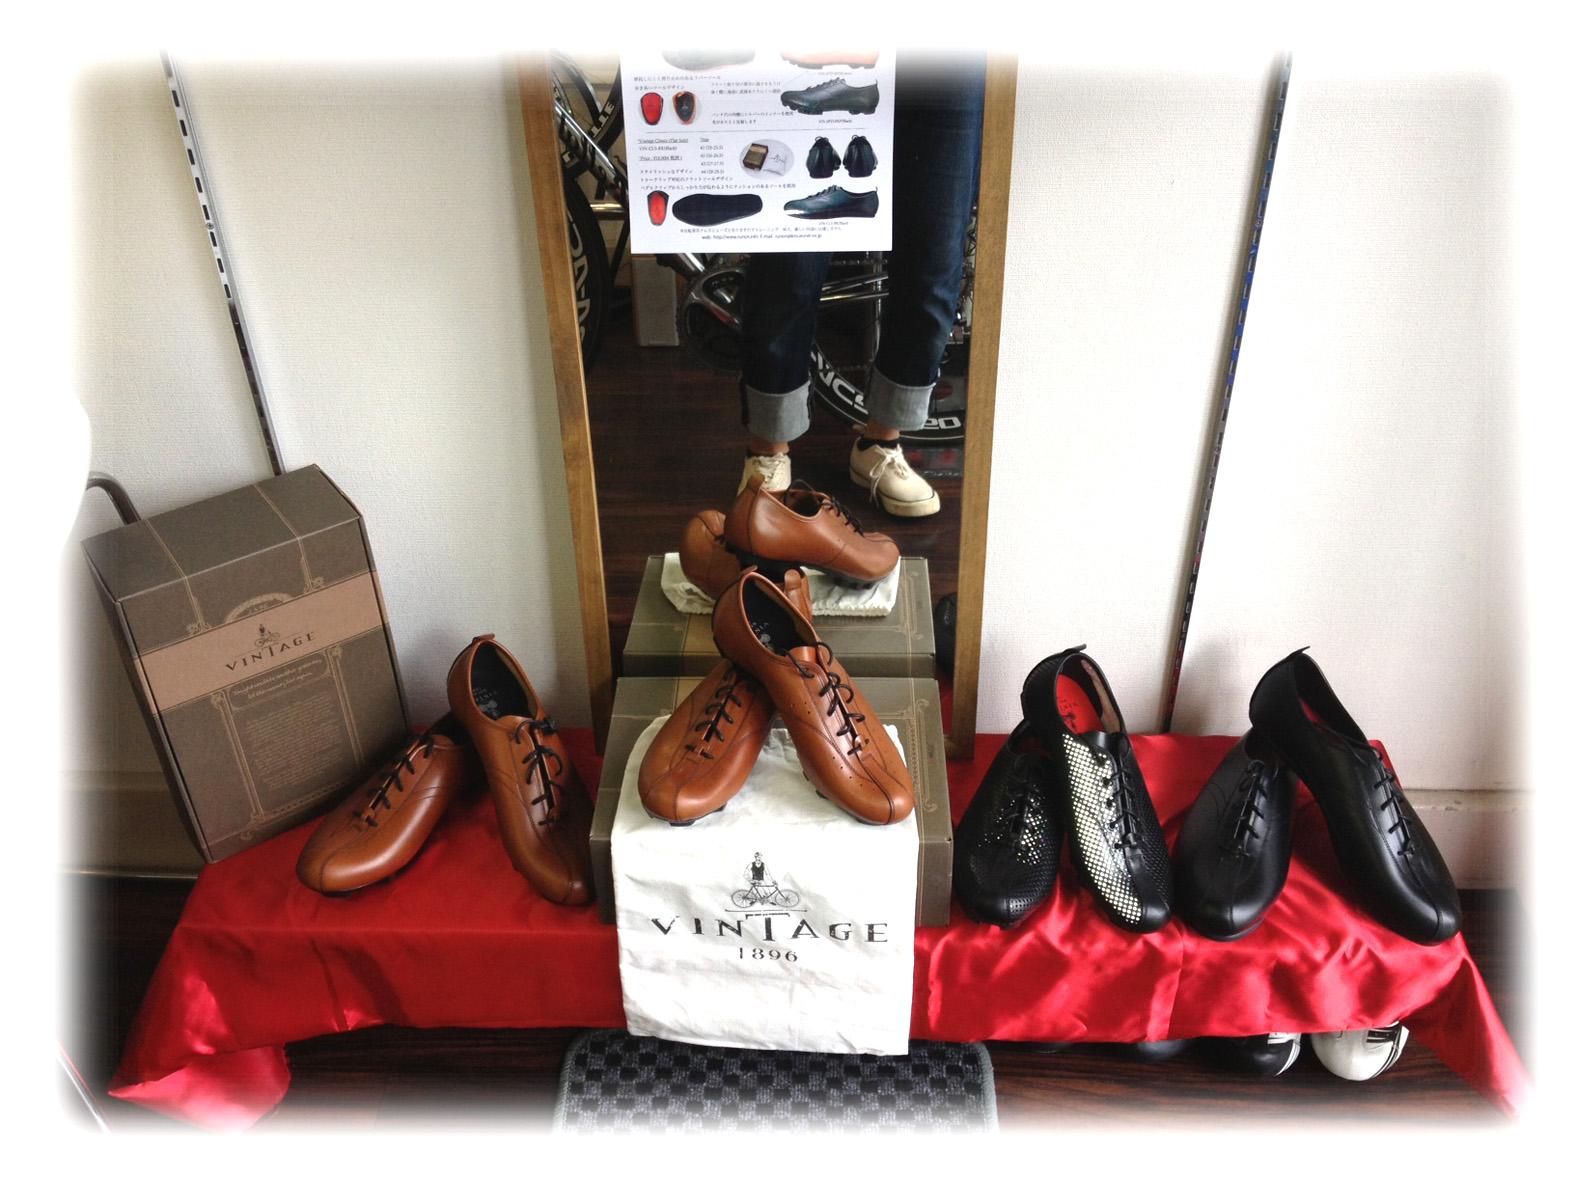 VINTAGE Shoes_d0182937_17352070.jpg